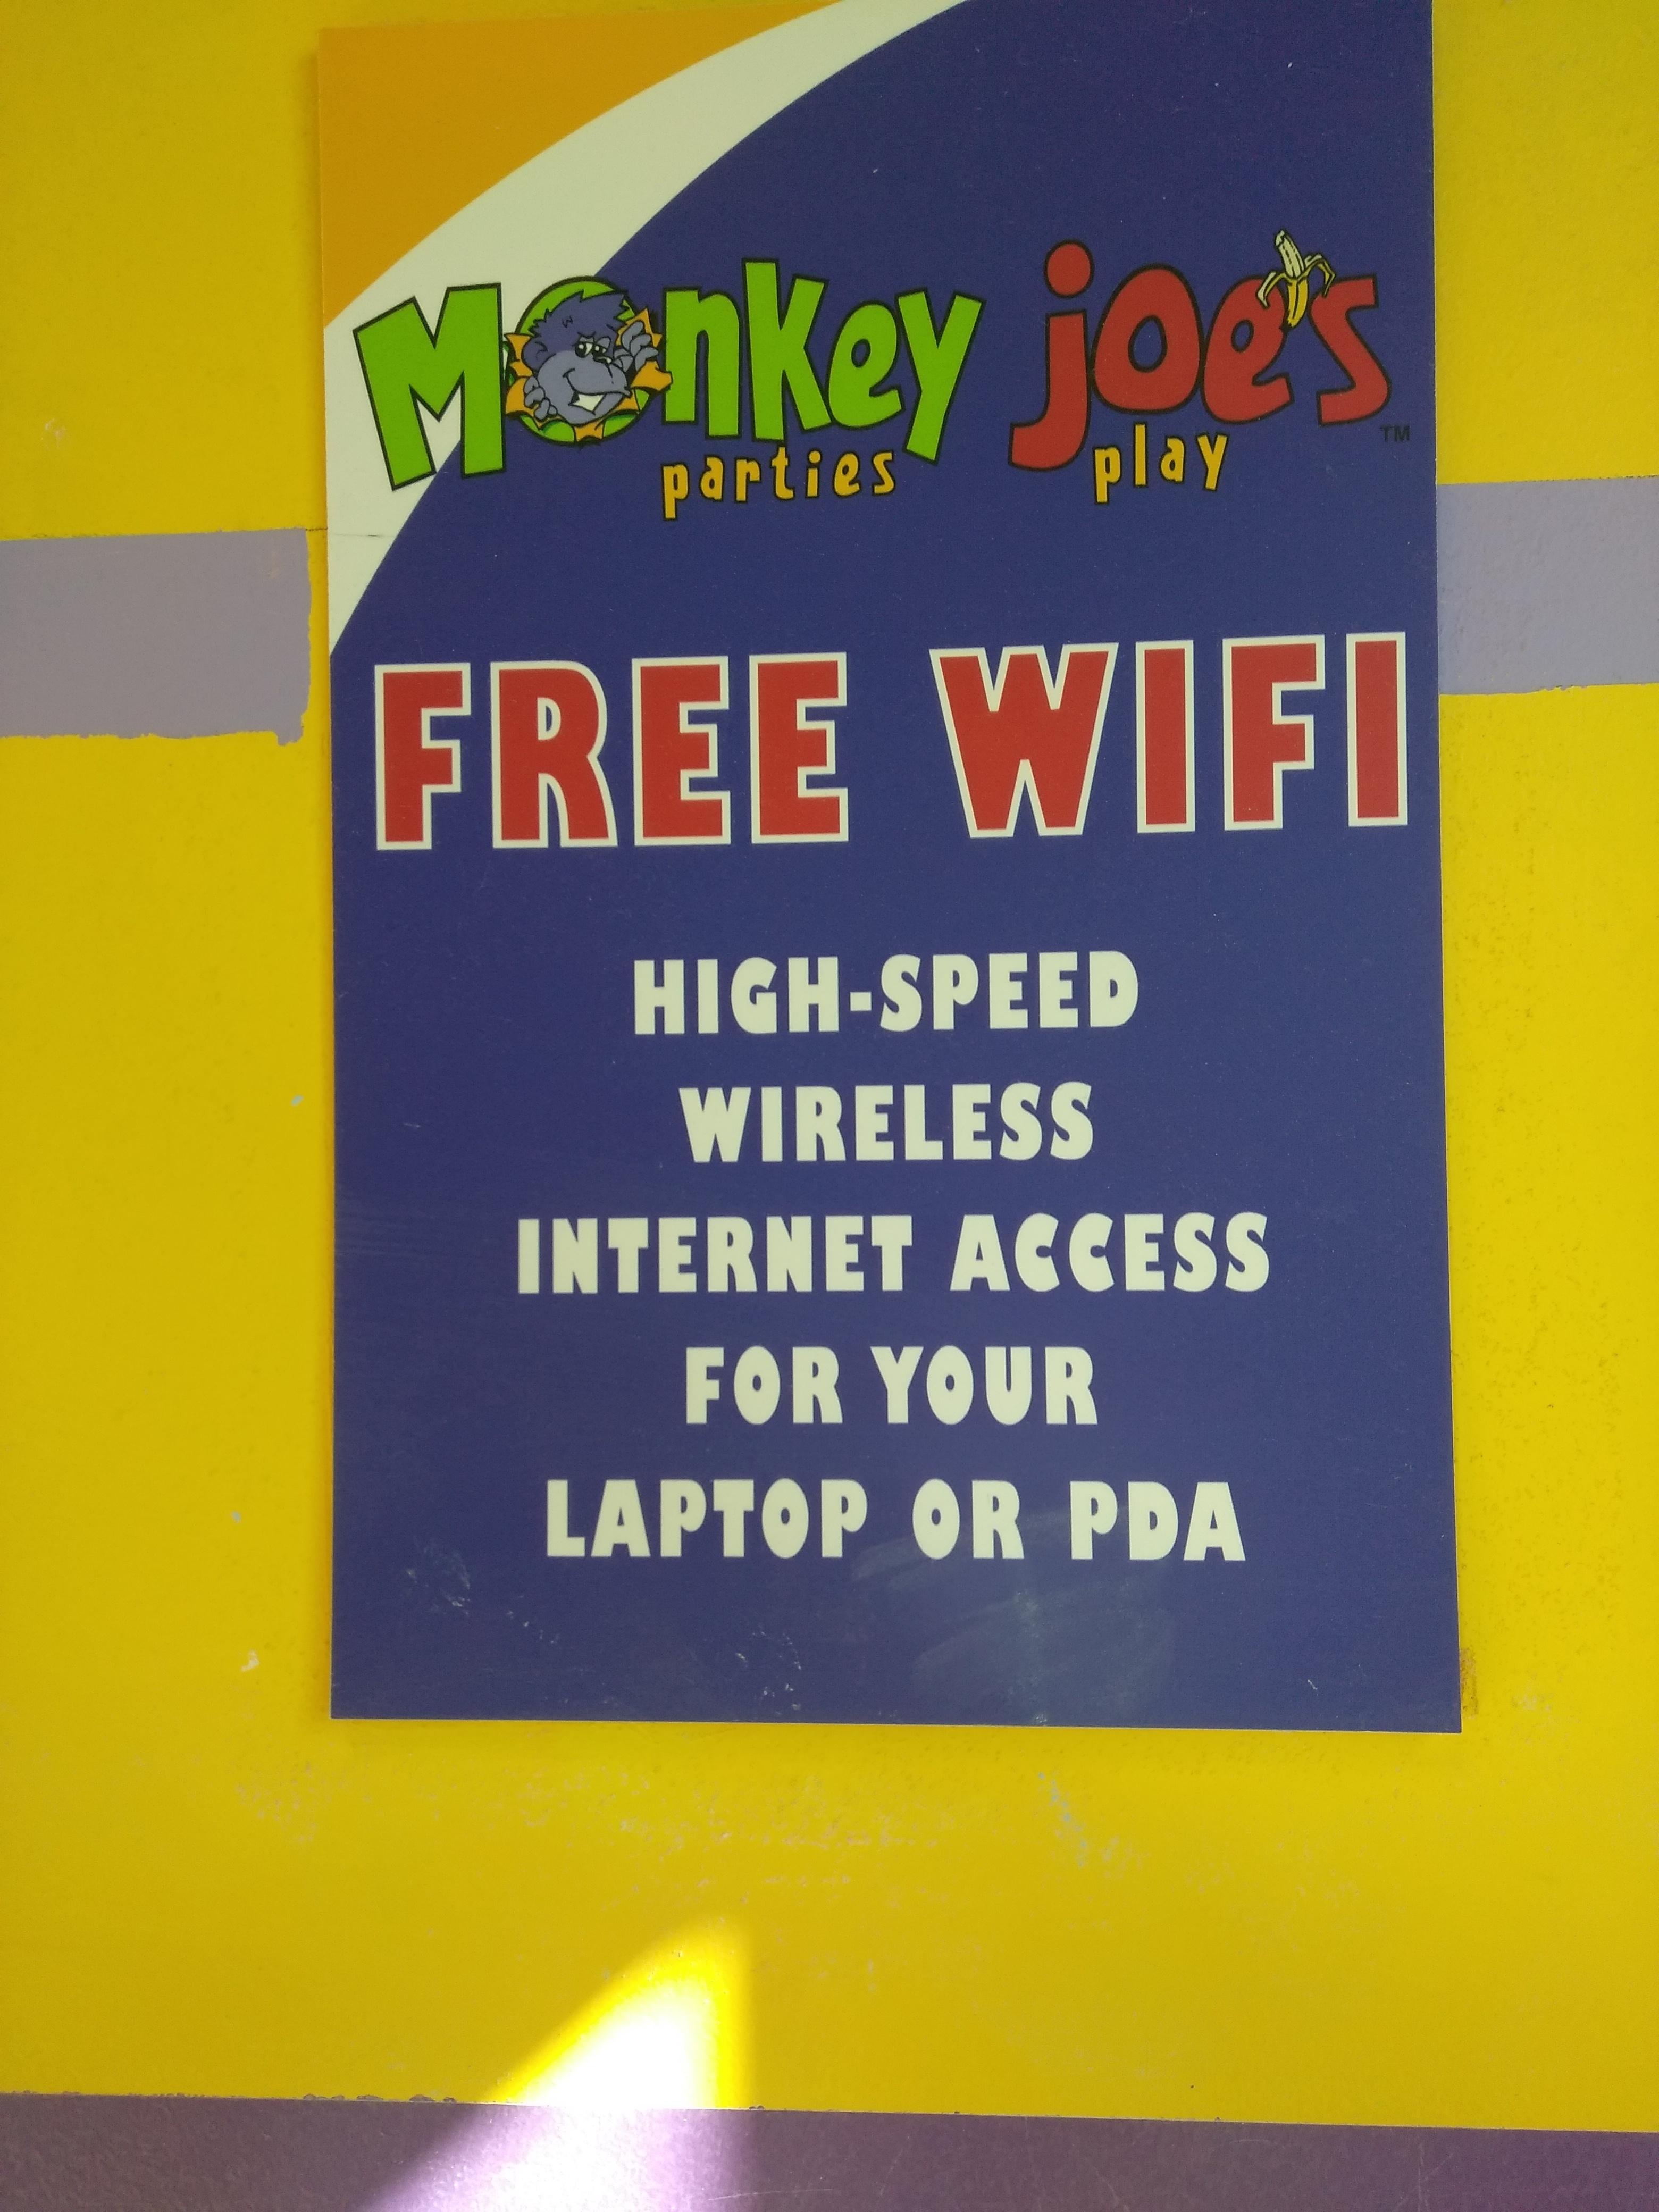 photograph regarding Monkey Joes Coupons Printable titled Monkey joes printable discount codes waukesha / Republic wi-fi